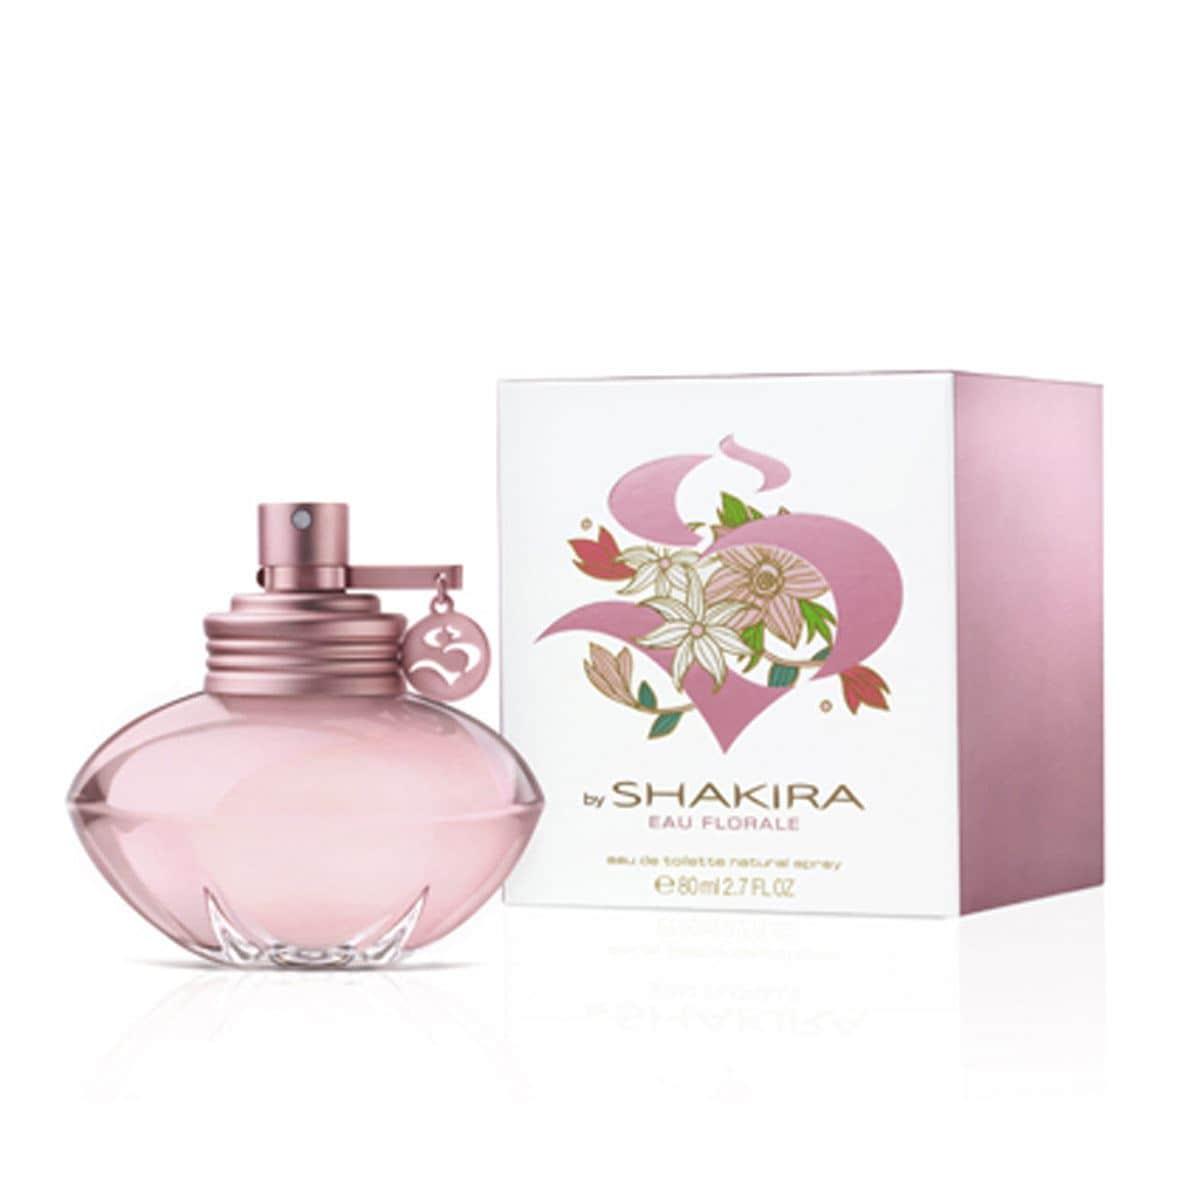 Fragancia para Dama, Shakira Eau Florale EDT 80ML